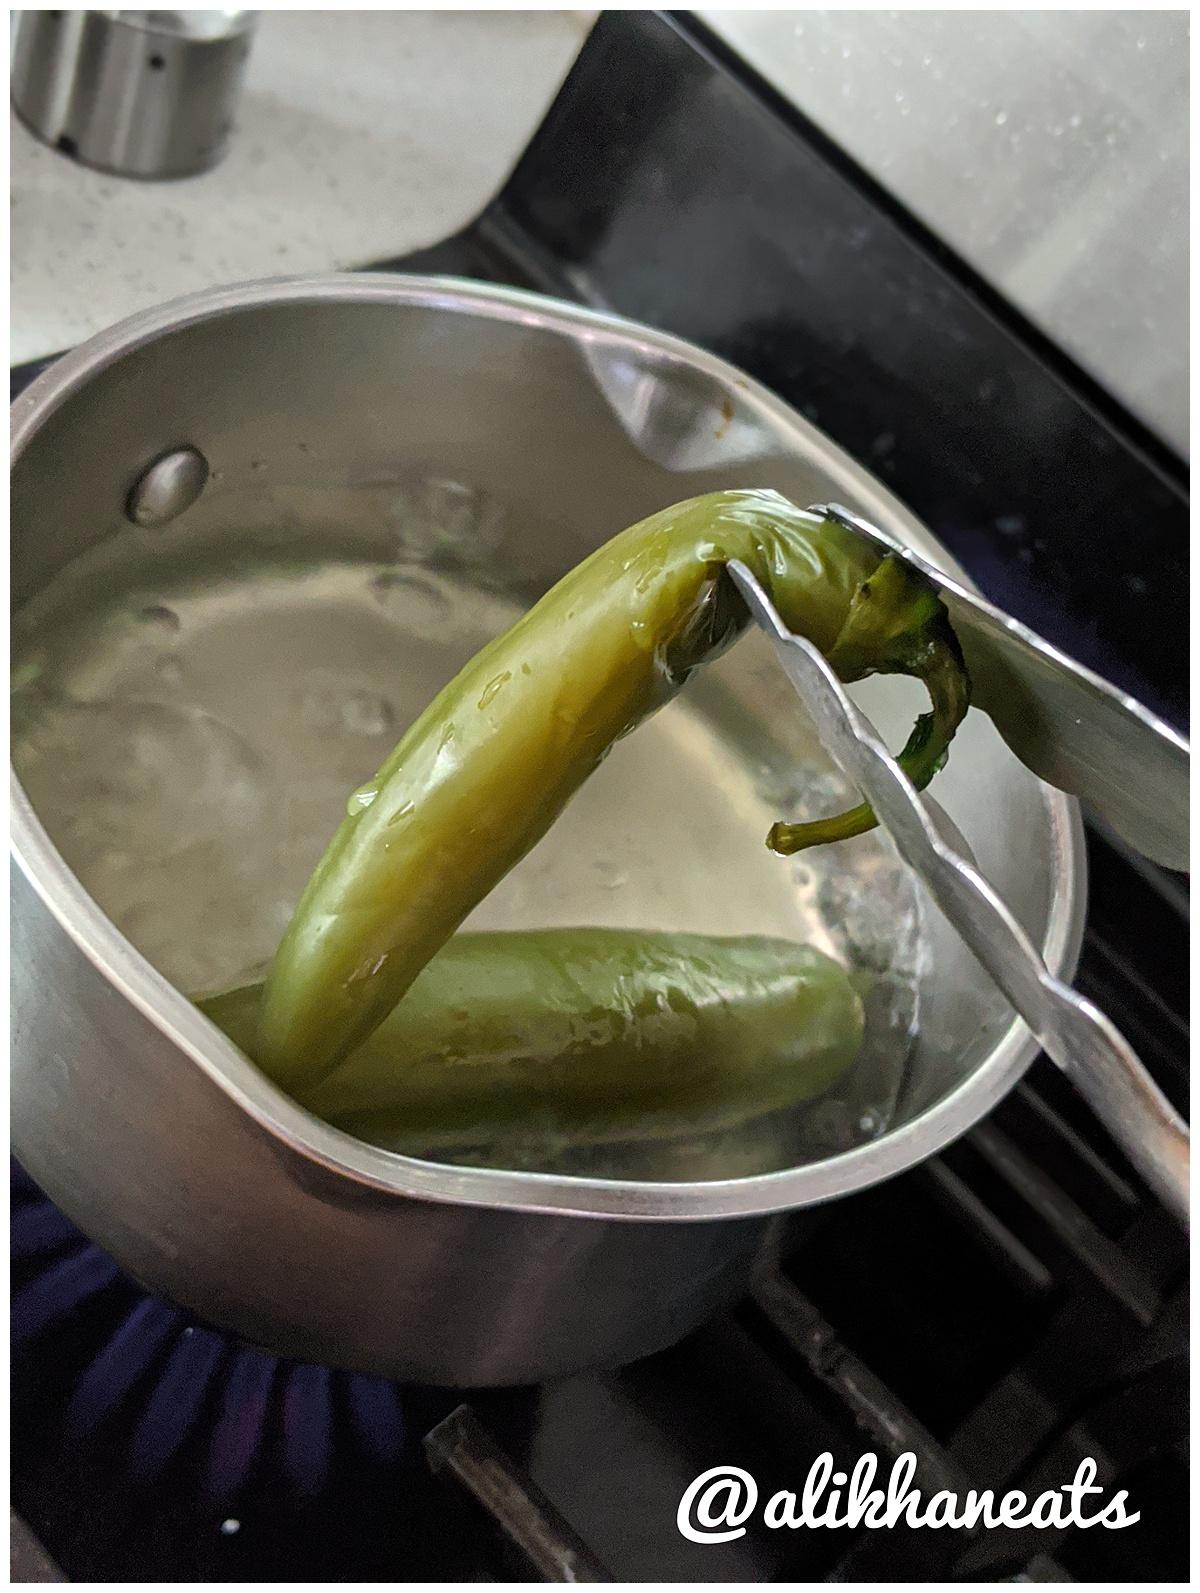 Jalapeño serrano salsa fully boiled